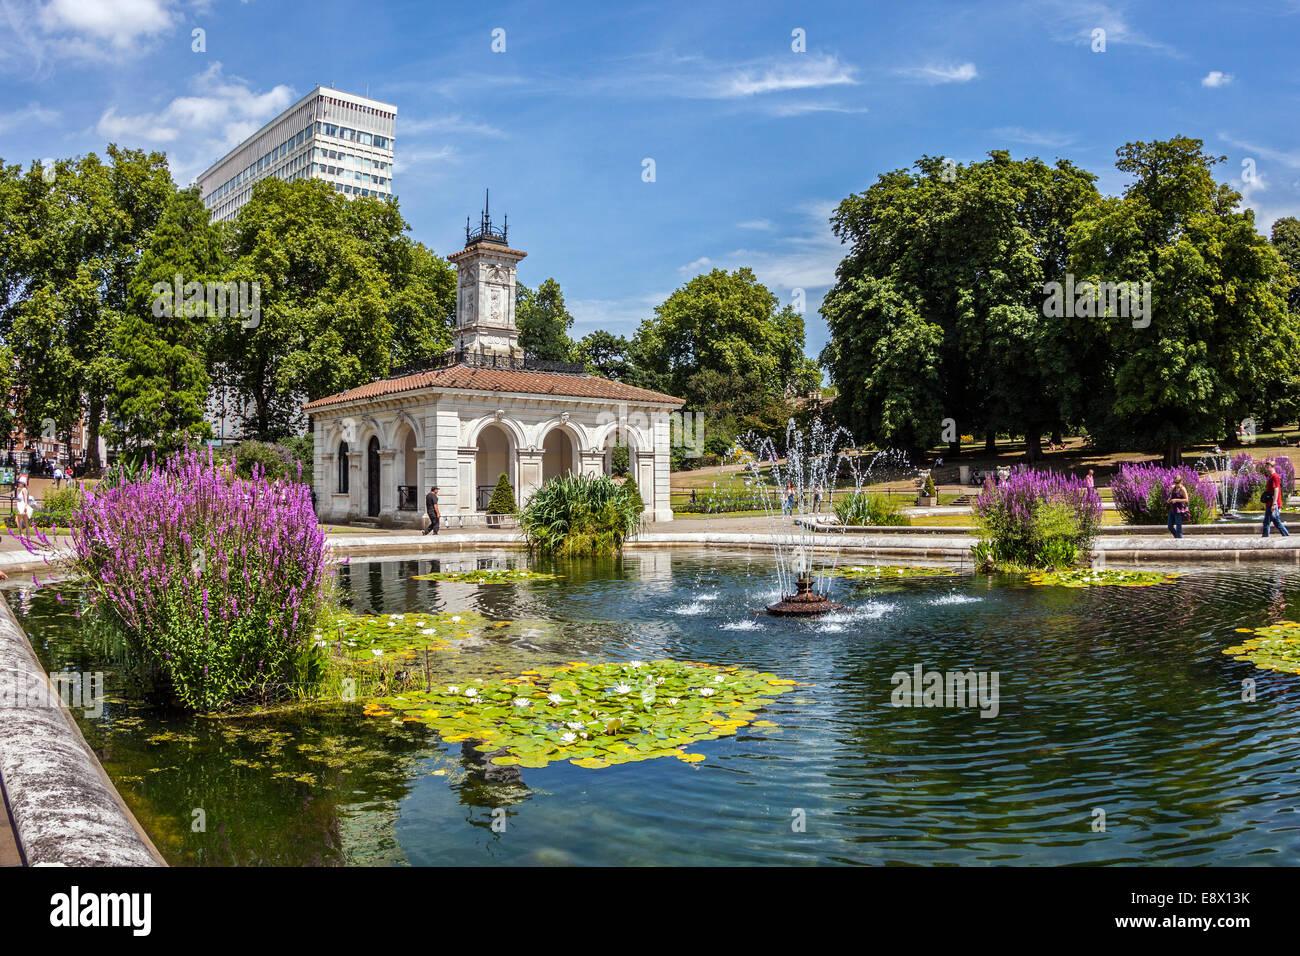 Pin italian gardens in kensington hyde park london on for Jardines italianos